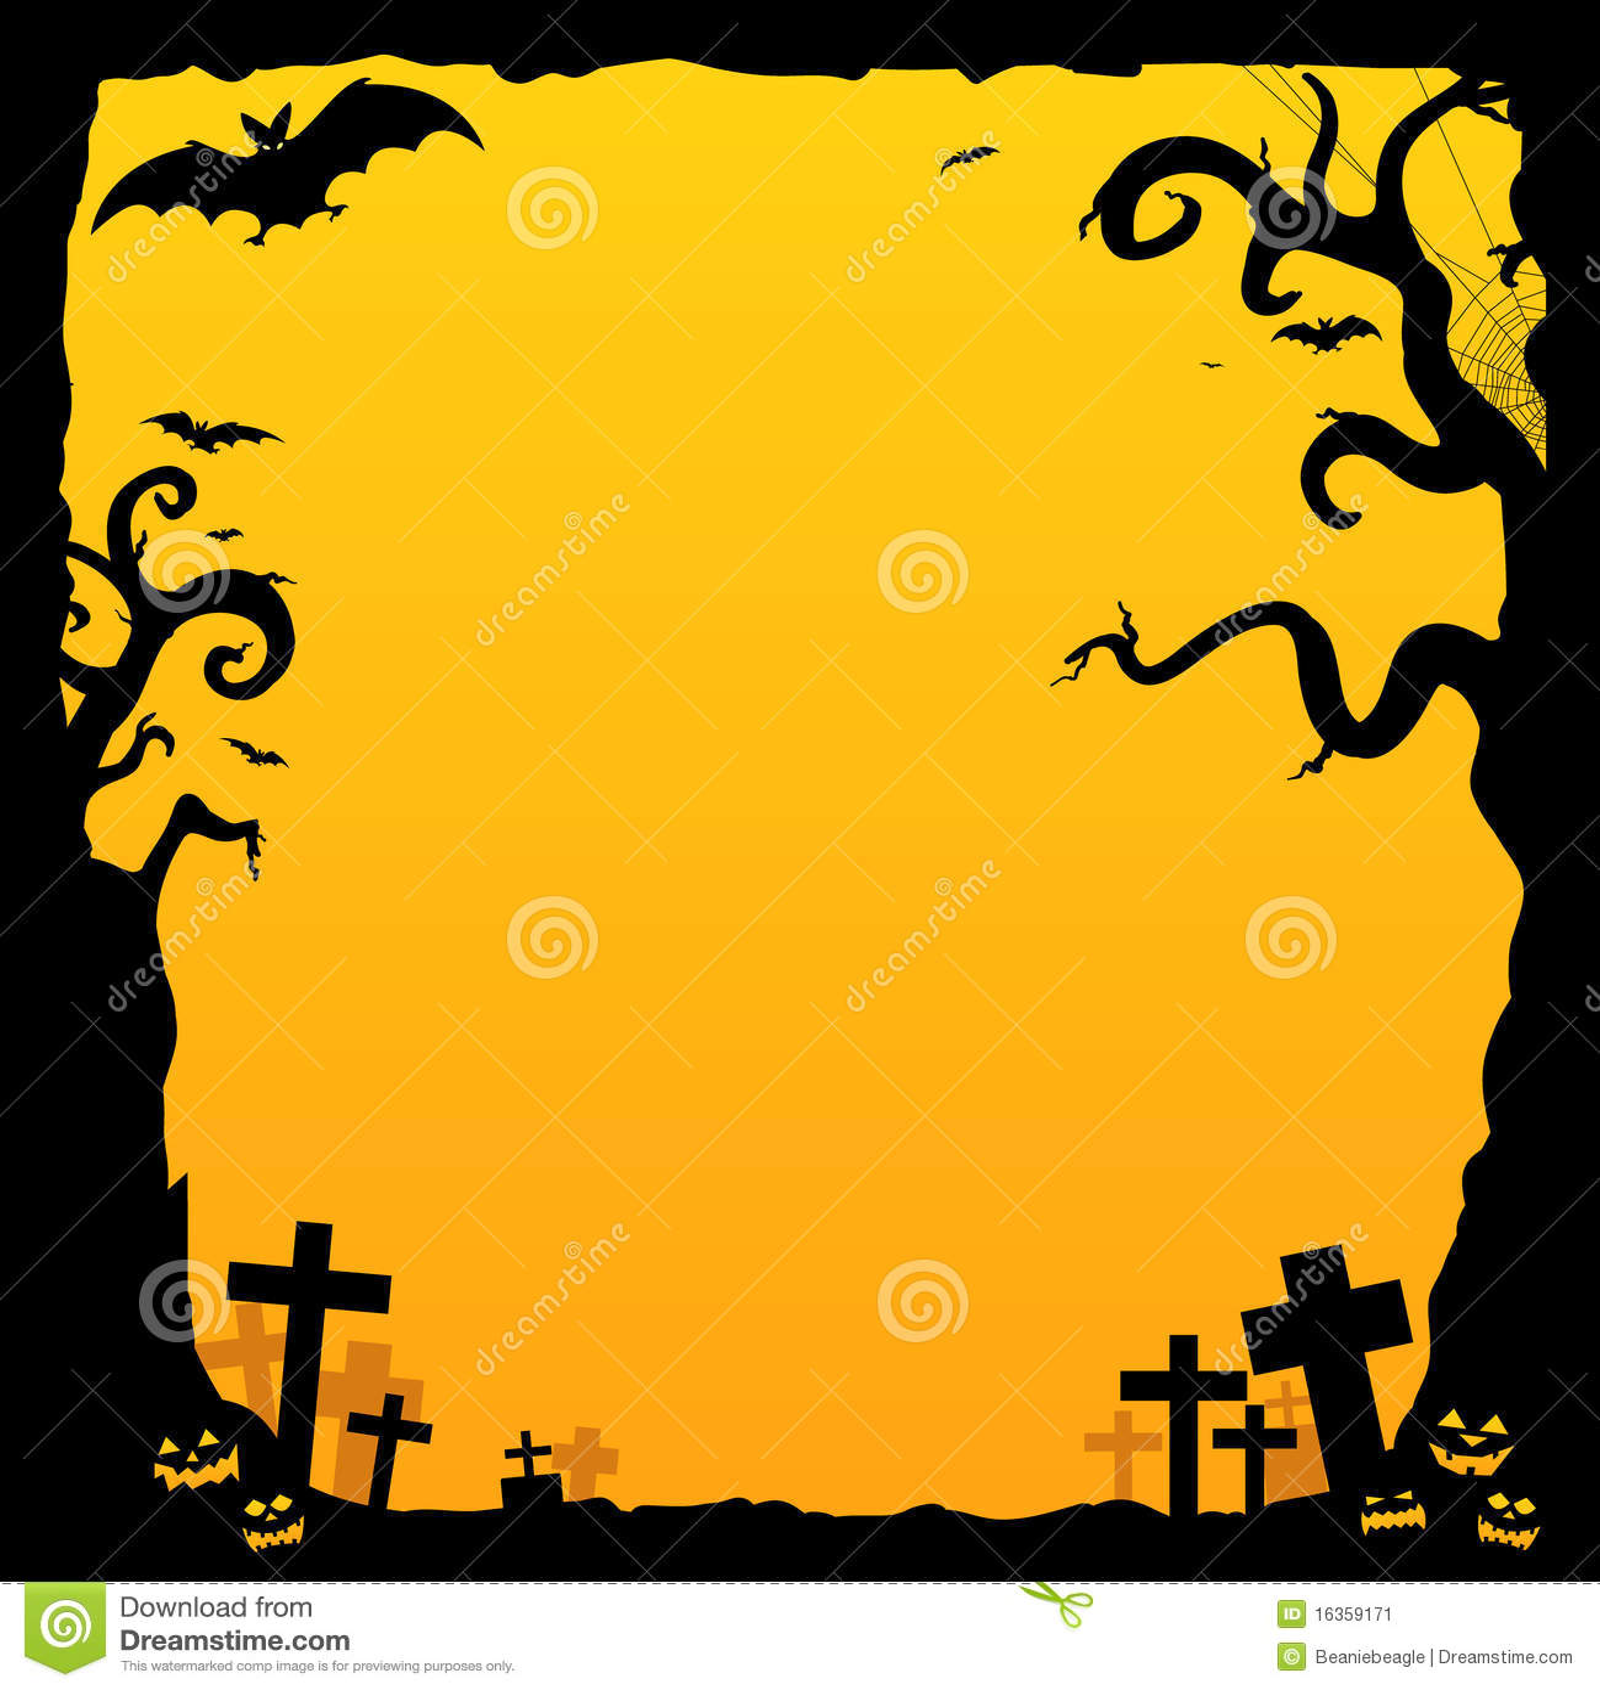 Fall Pumpkin Wallpaper Desktop Halloween Background Stock Vector Image Of Blank